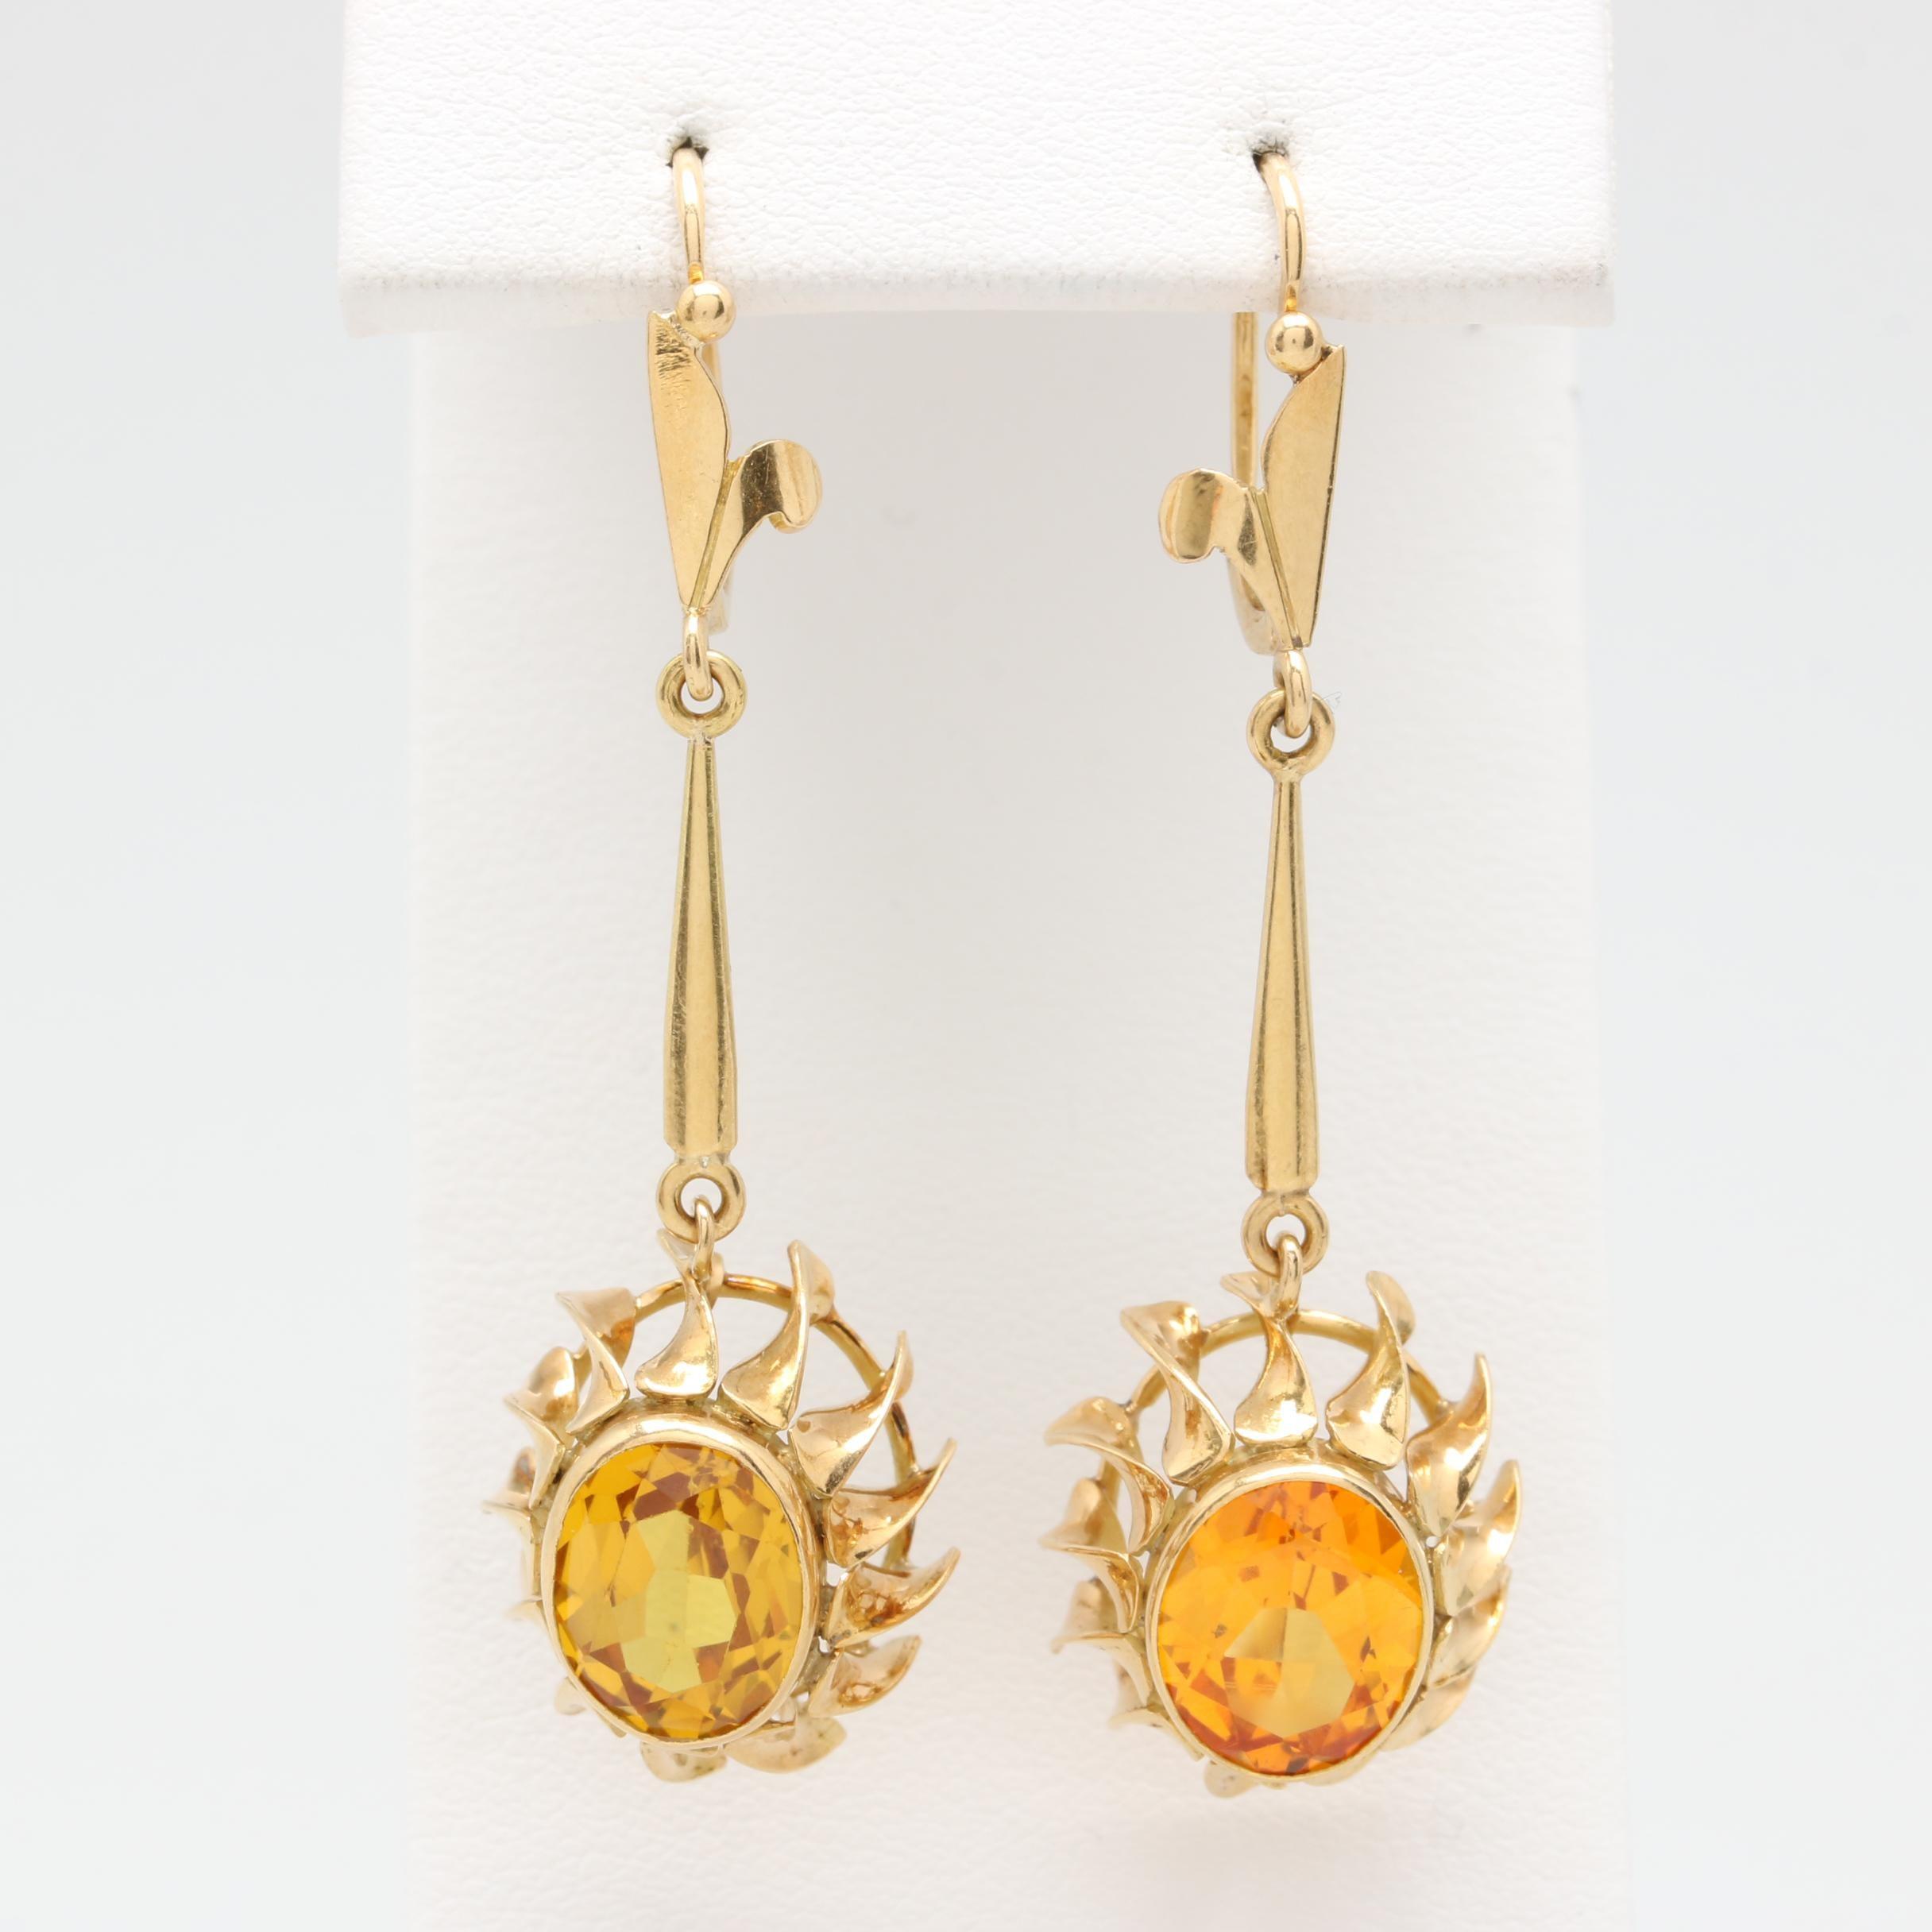 14K Yellow Gold Synthetic Yellow Sapphire Drop Earrings